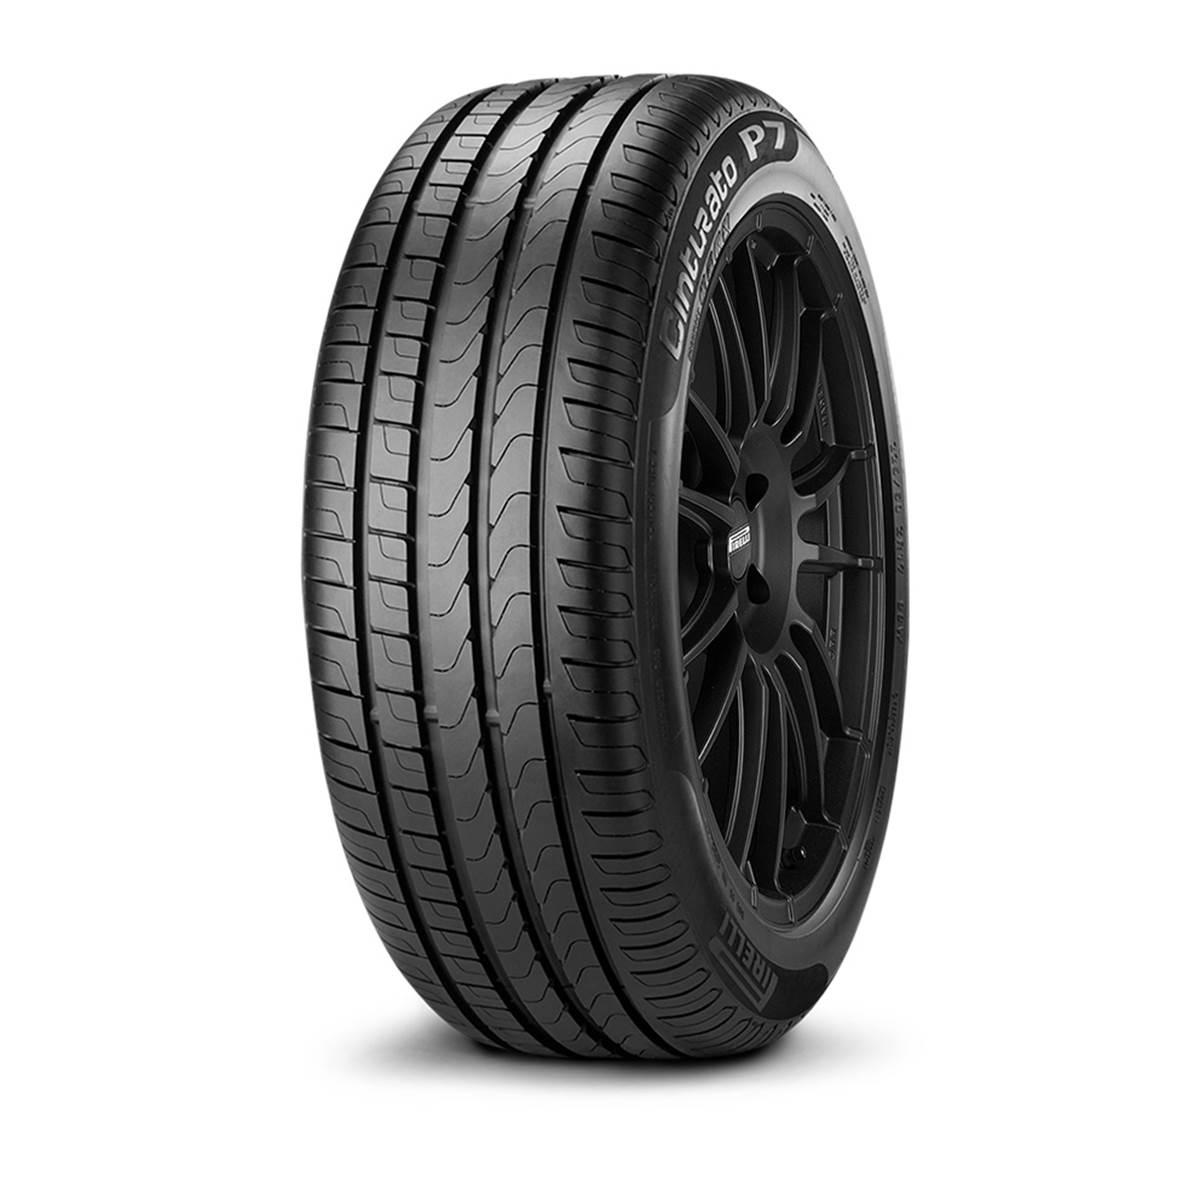 Pneu Pirelli 205/55R17 91V Cinturato P7